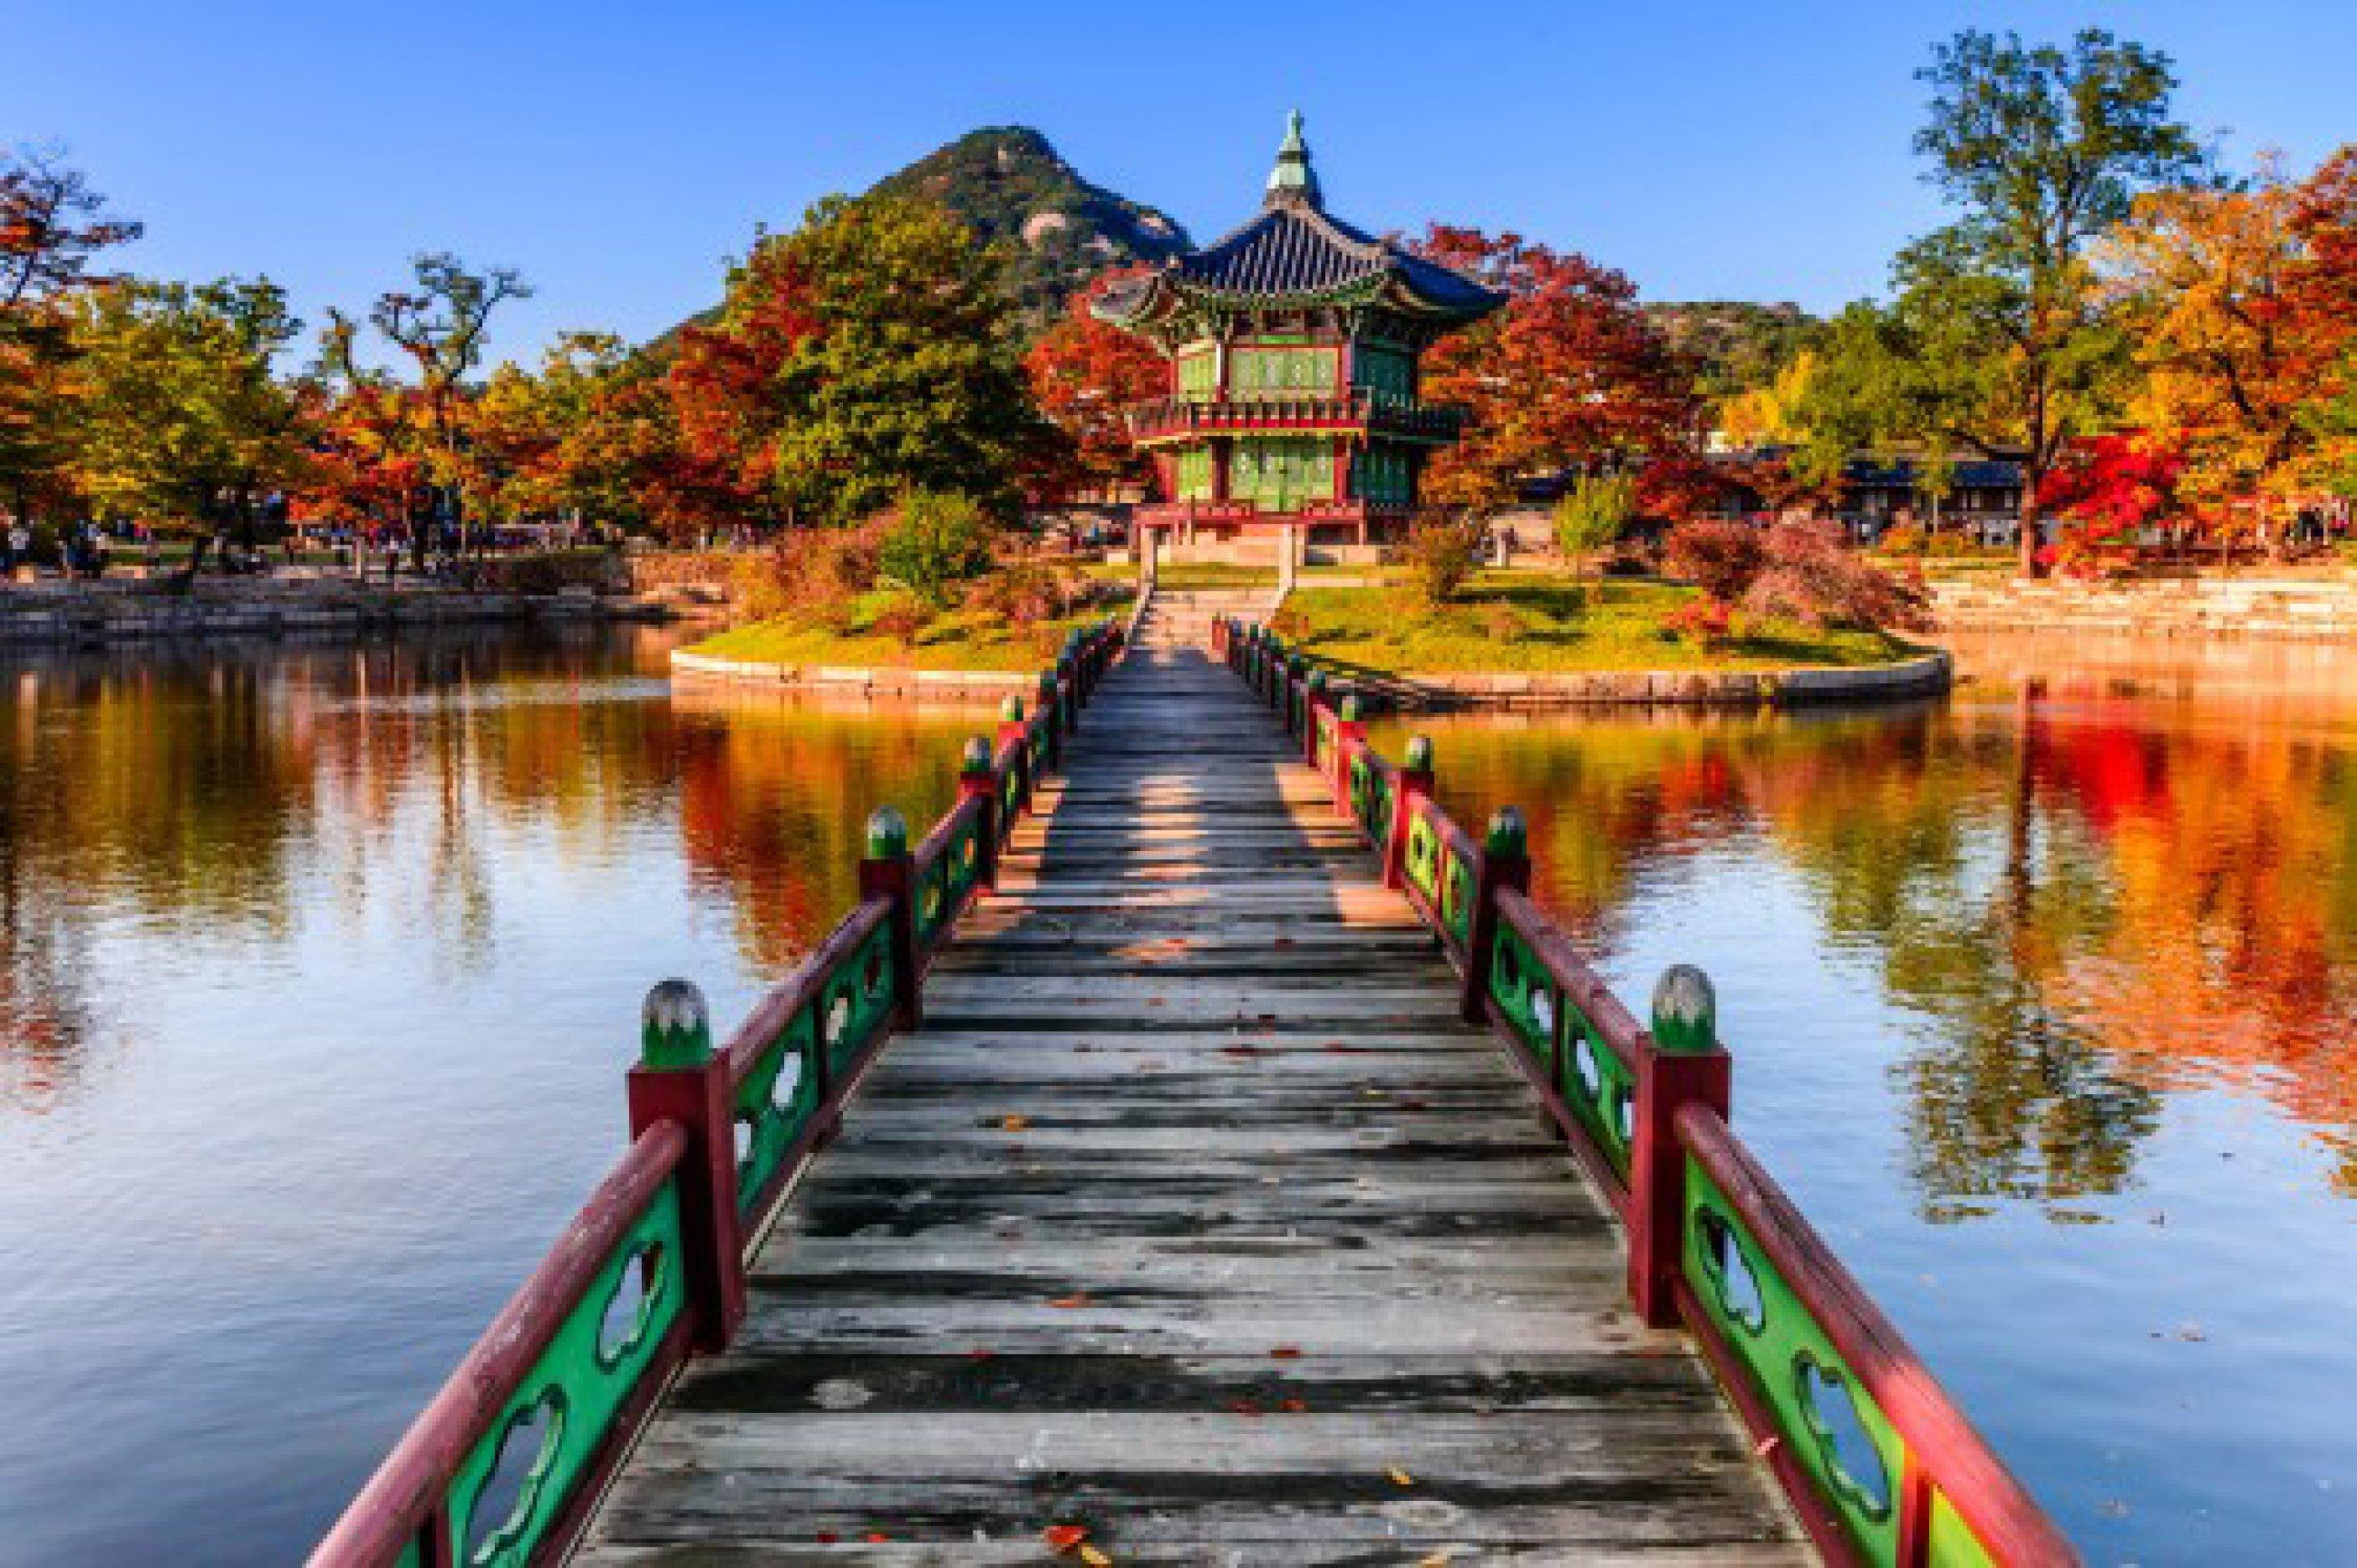 https://bubo.sk/uploads/galleries/7452/gyeongbokgung-palace-in-seoul-korea.jpg